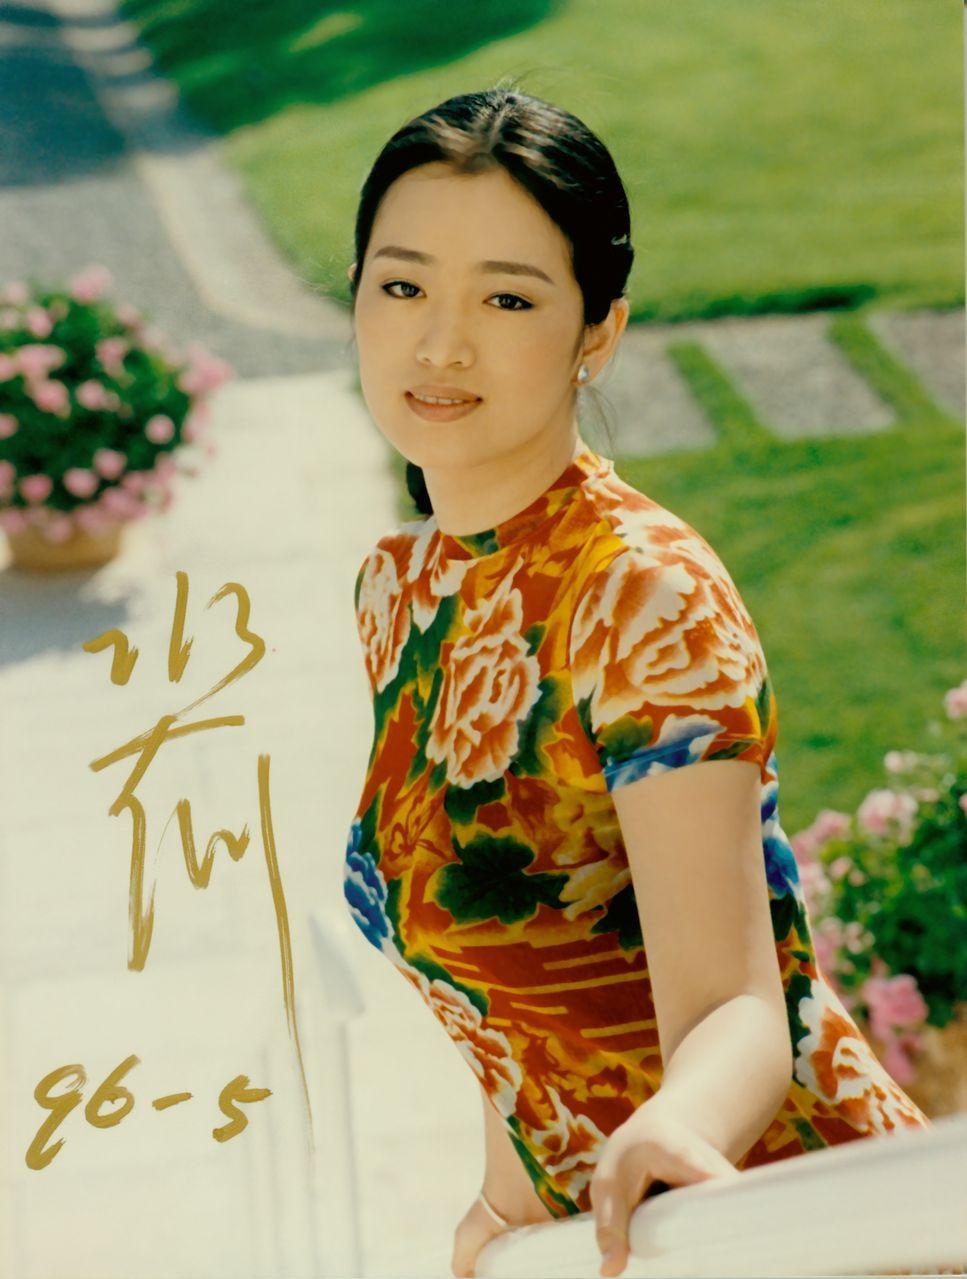 Gong Li photo 125 of 174 pics, wallpaper - photo #677401